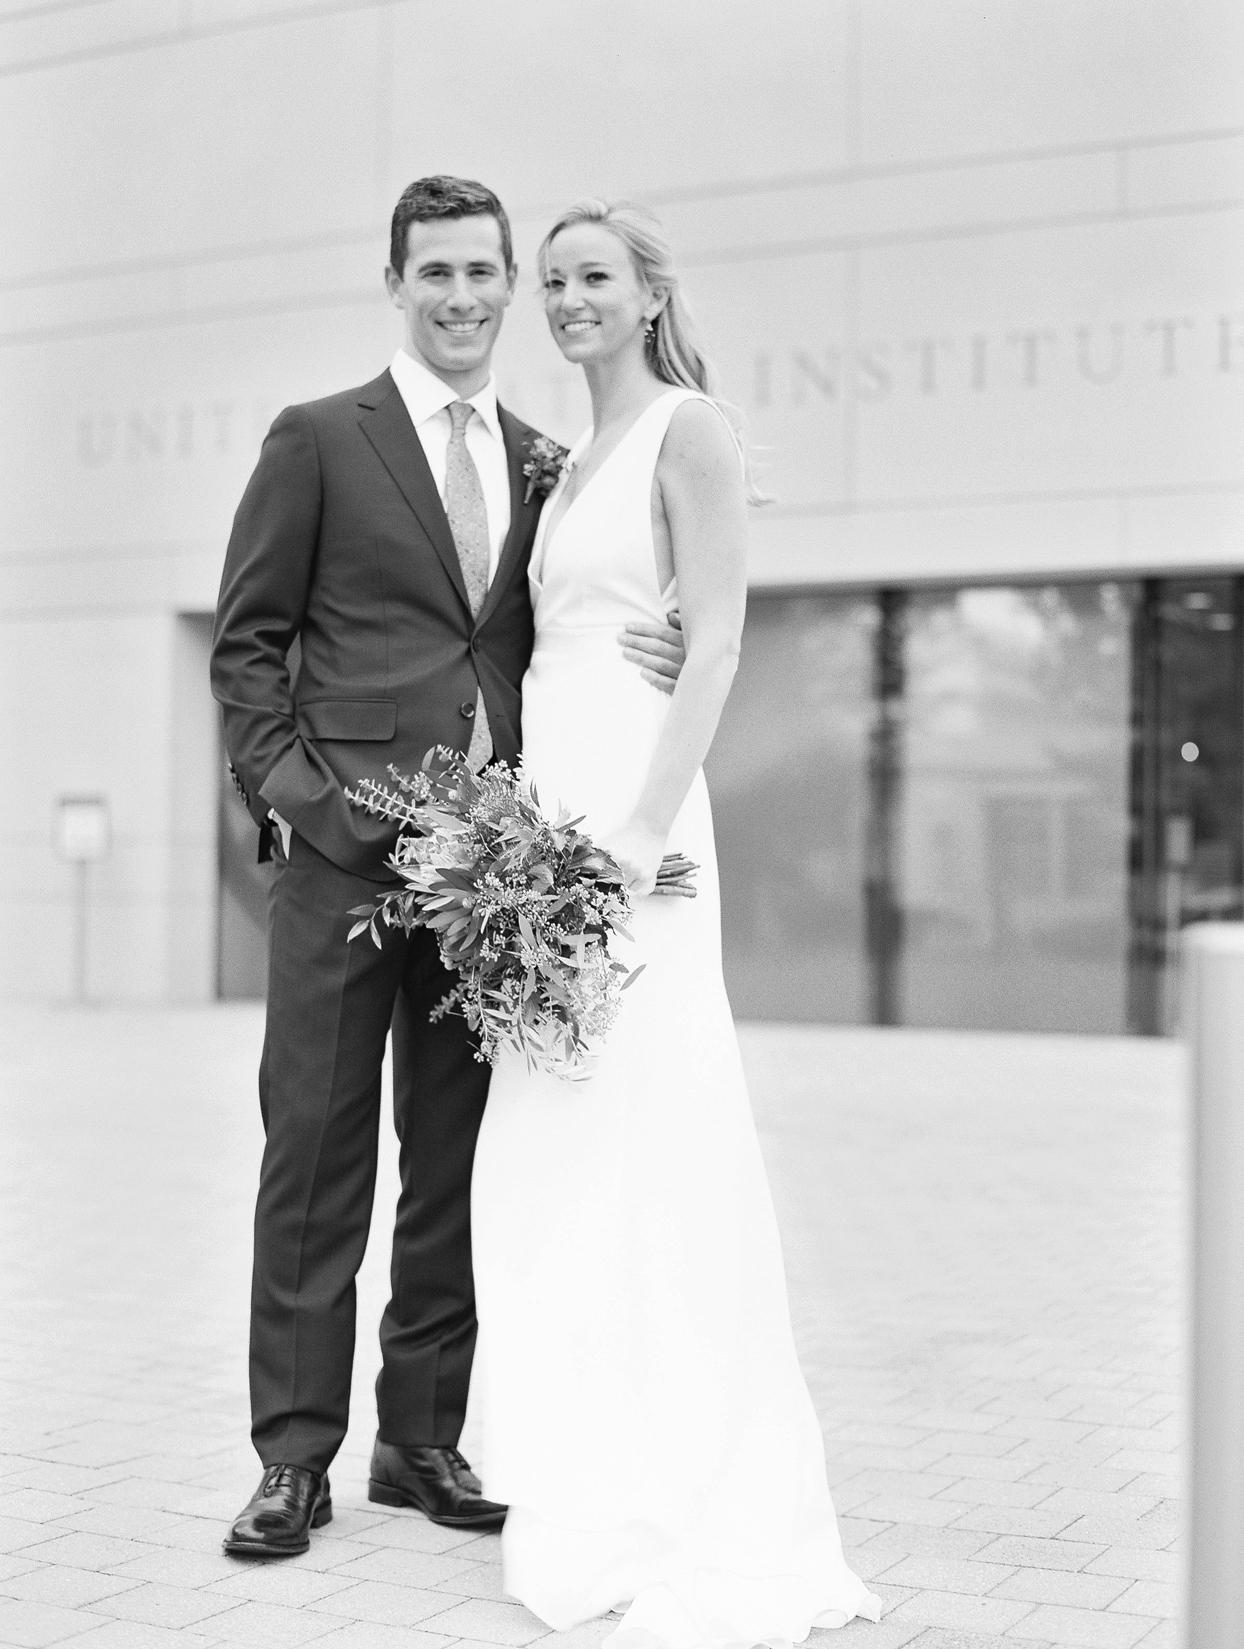 bride and groom smile for portrait shot outside